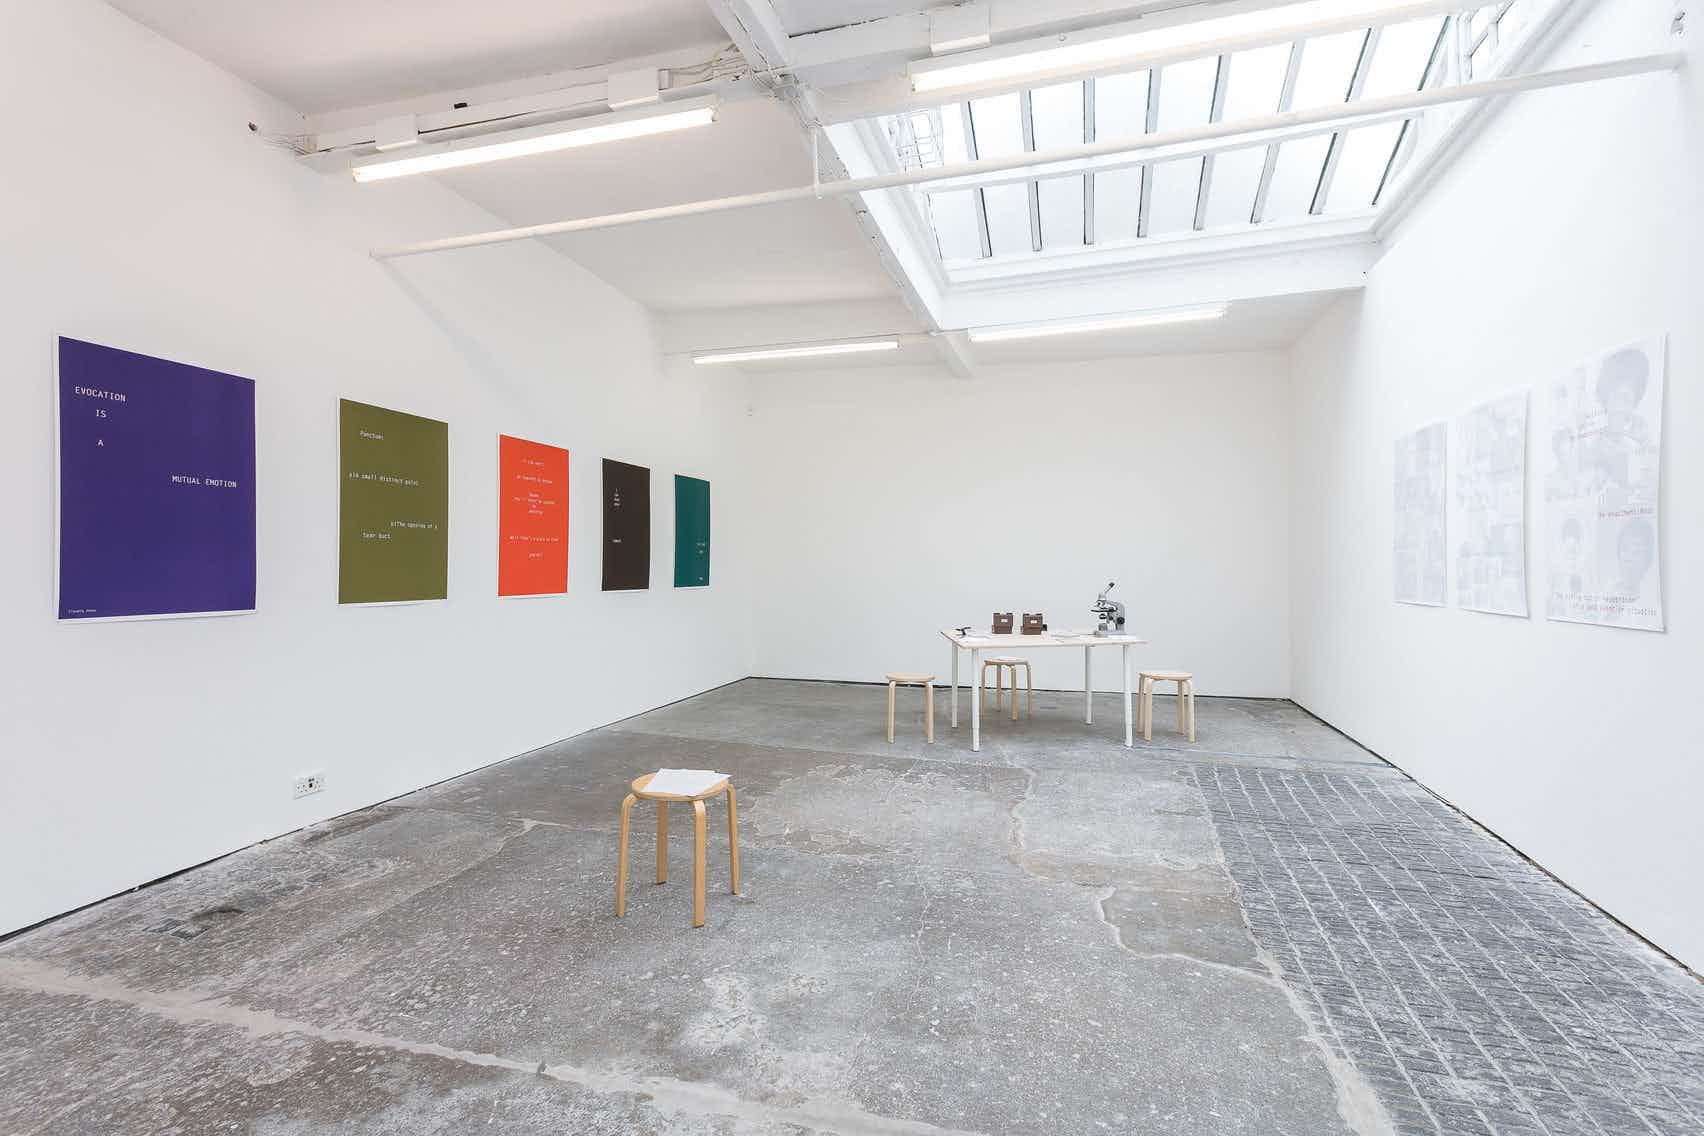 Gallery Space, Cubitt Gallery